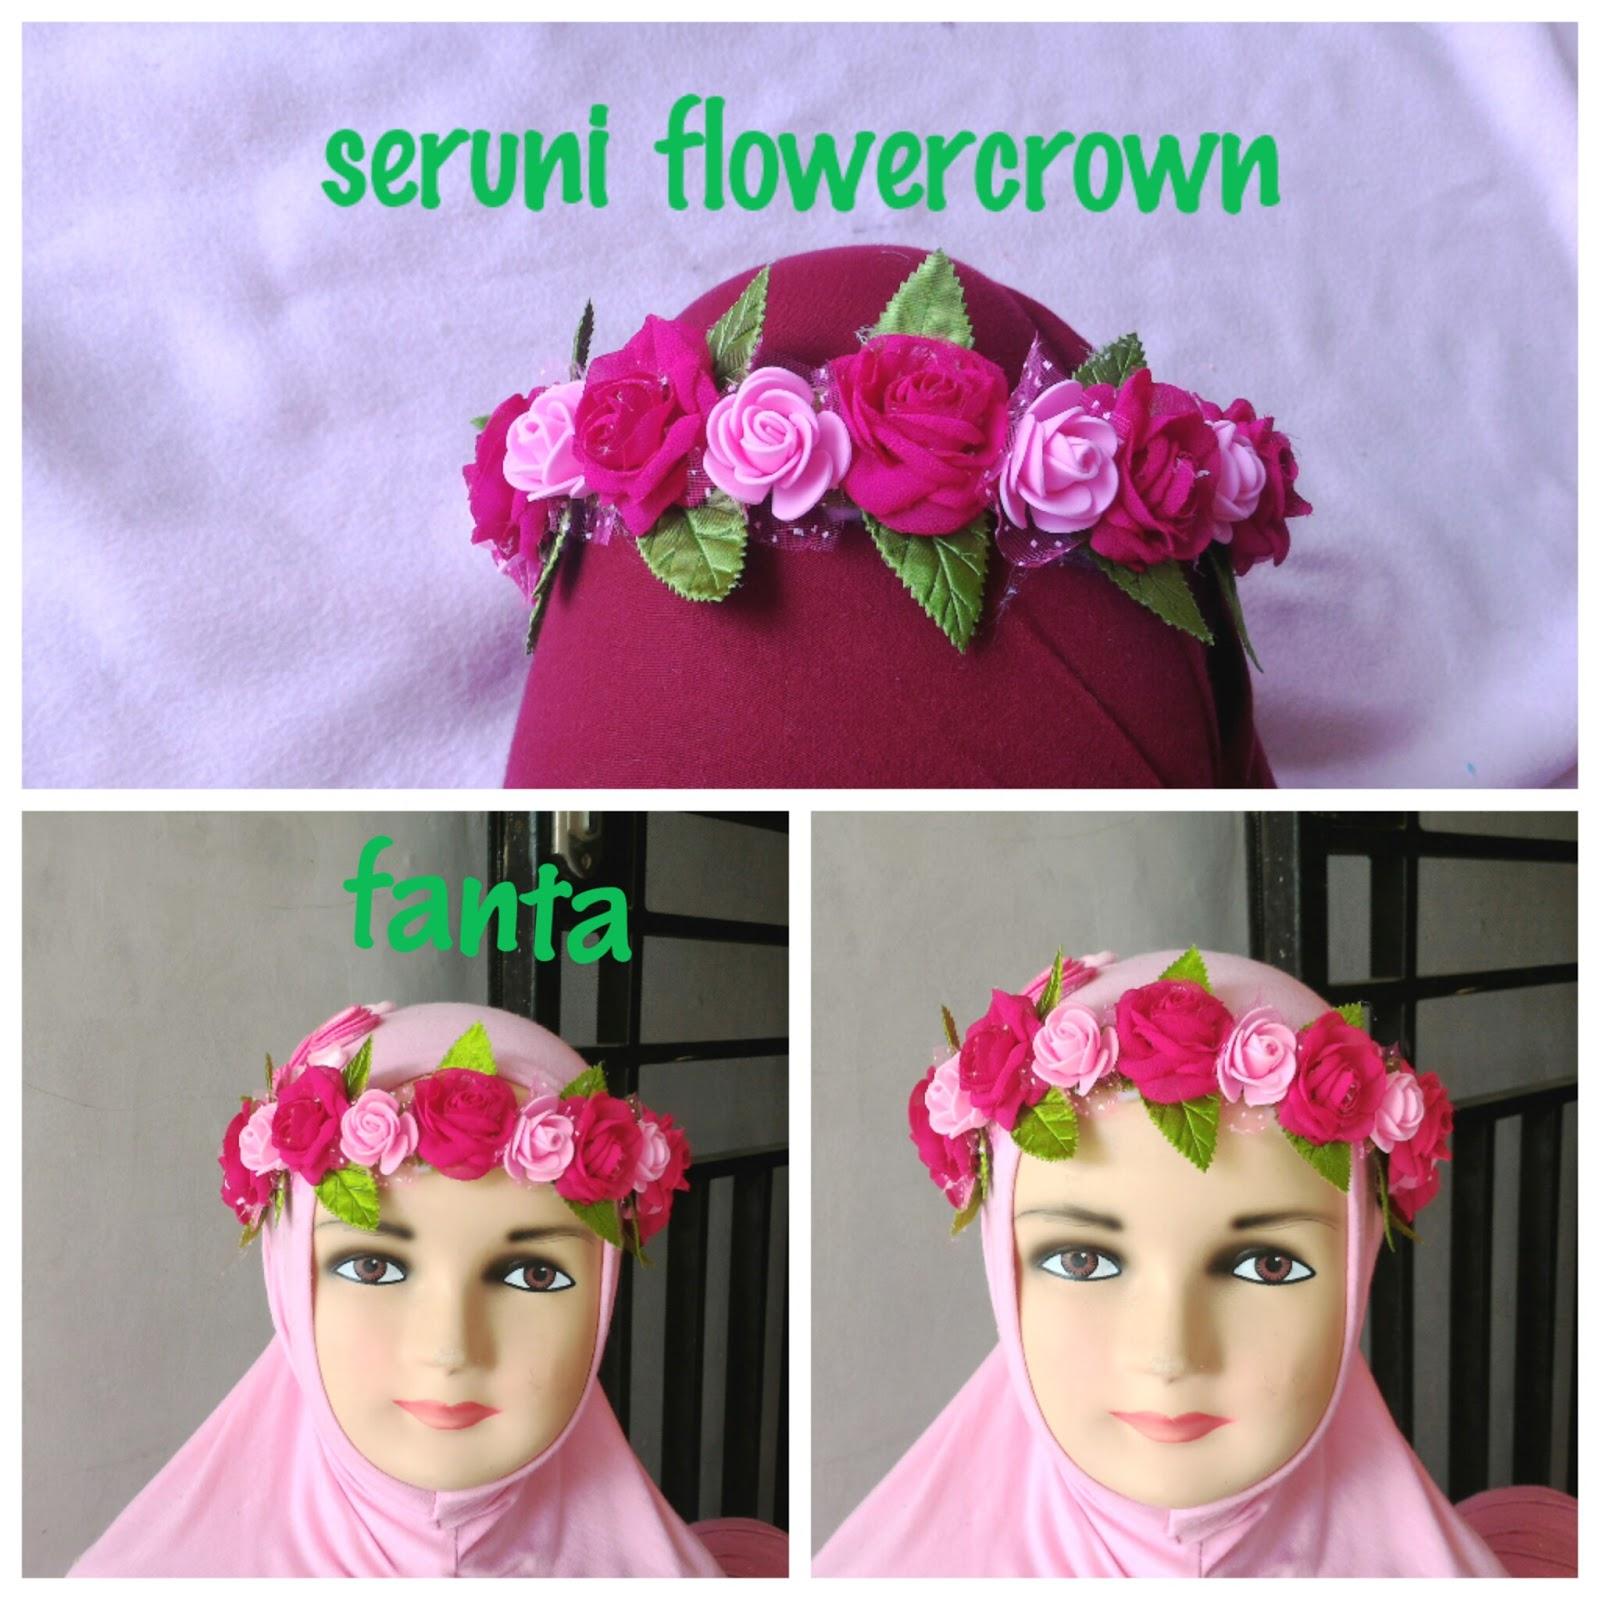 Seruni flowercrown produsen dan supplier aksesoris handmade beli lebih banyak harga nego wa 085640465300 ig rajarajutbros izmirmasajfo